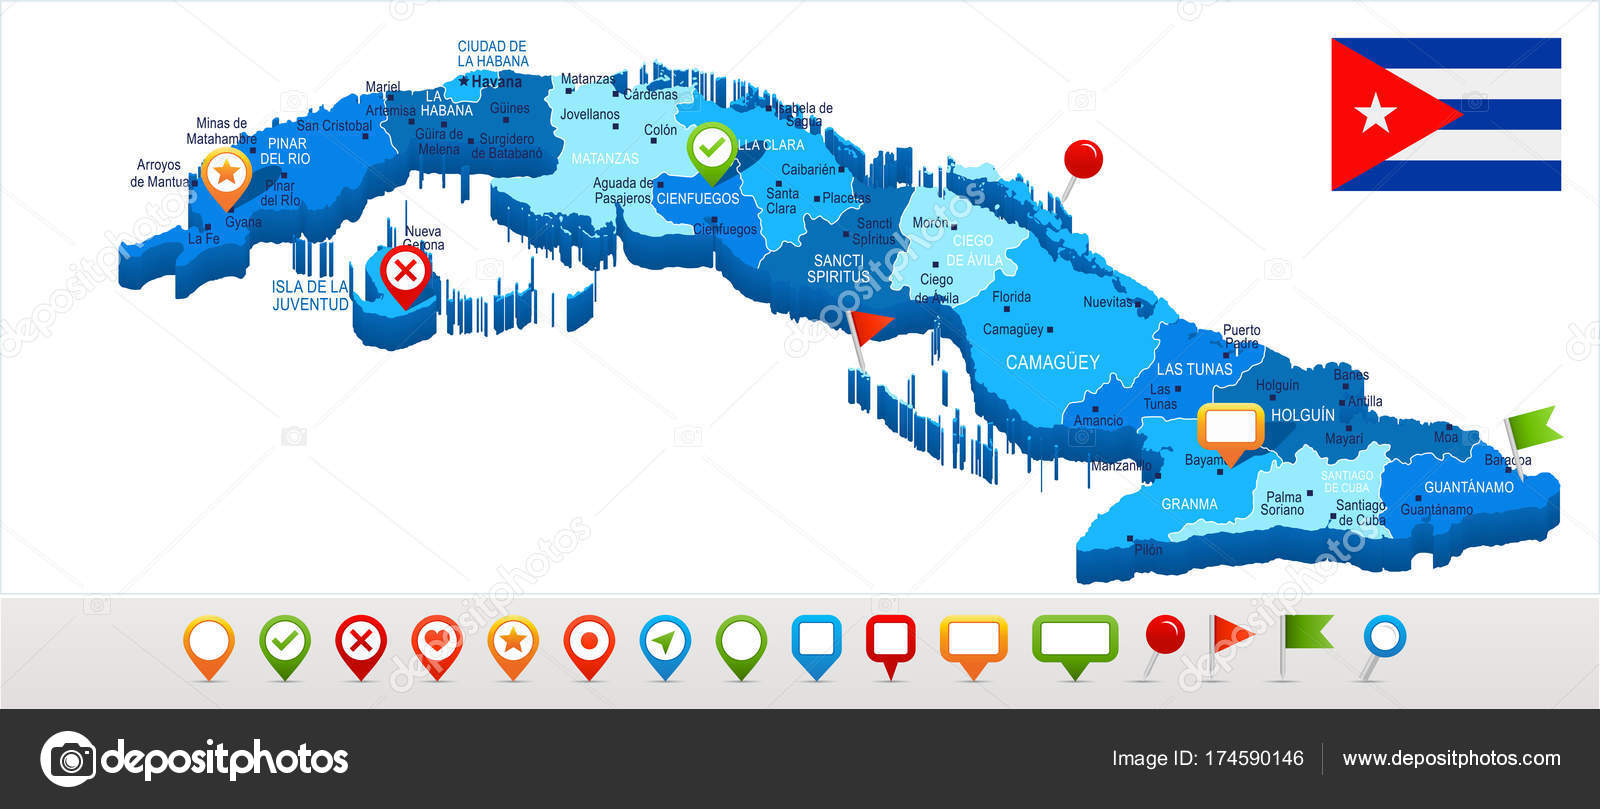 Karte Kuba.Kuba Karte Und Flagge Detaillierte Vektor Illustration